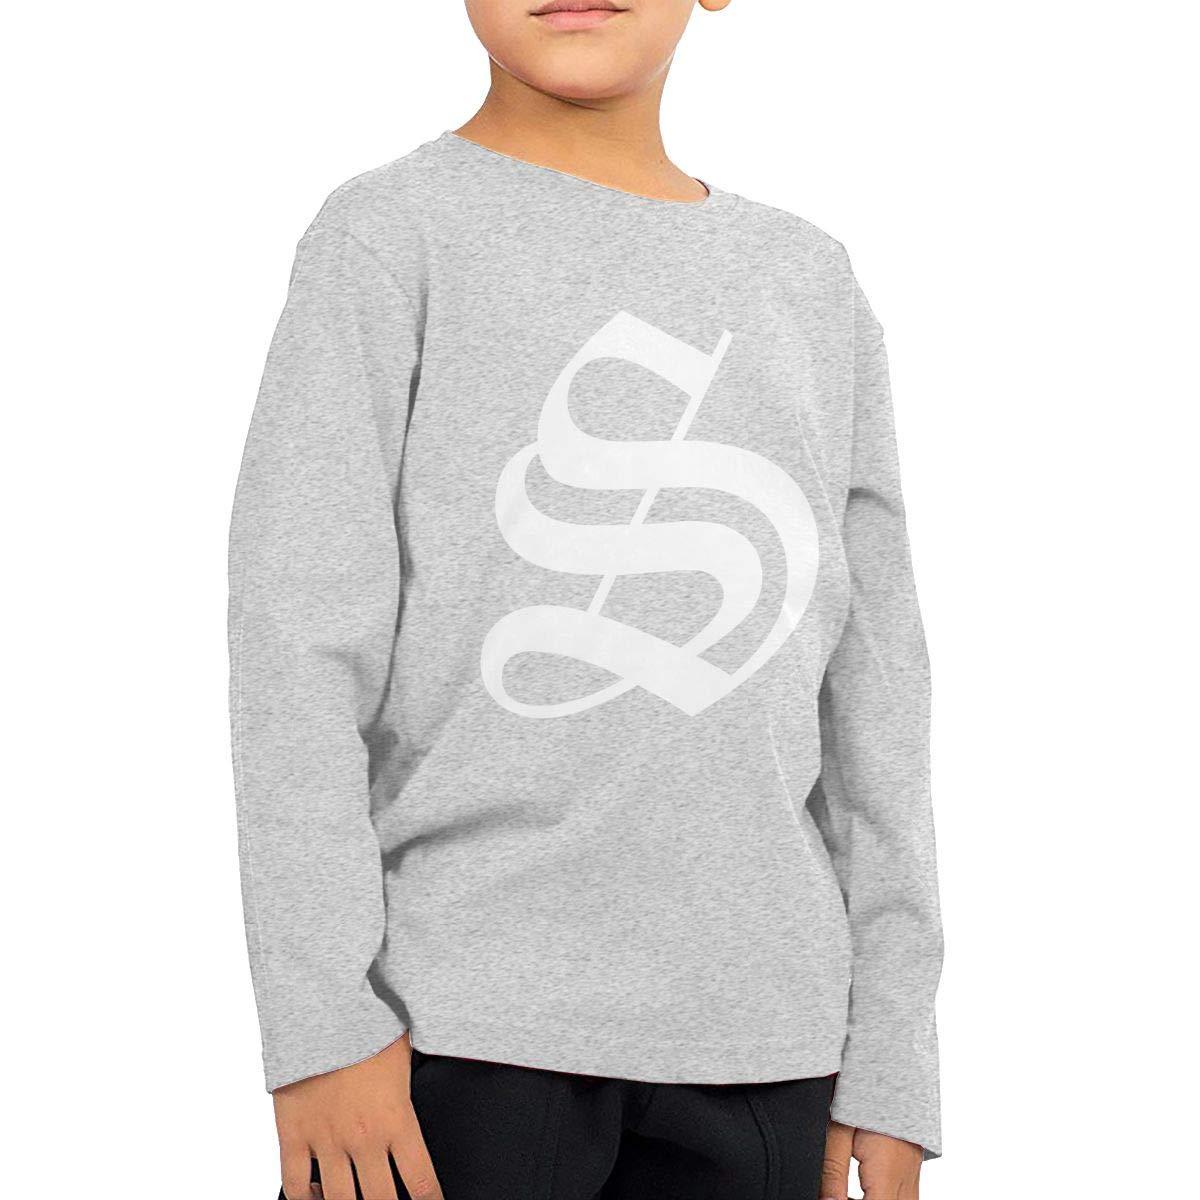 HADYKIDSLOVE Old English Letter S Initial Kids T-Shirt Long Sleeve Boys Girls T-Shirt